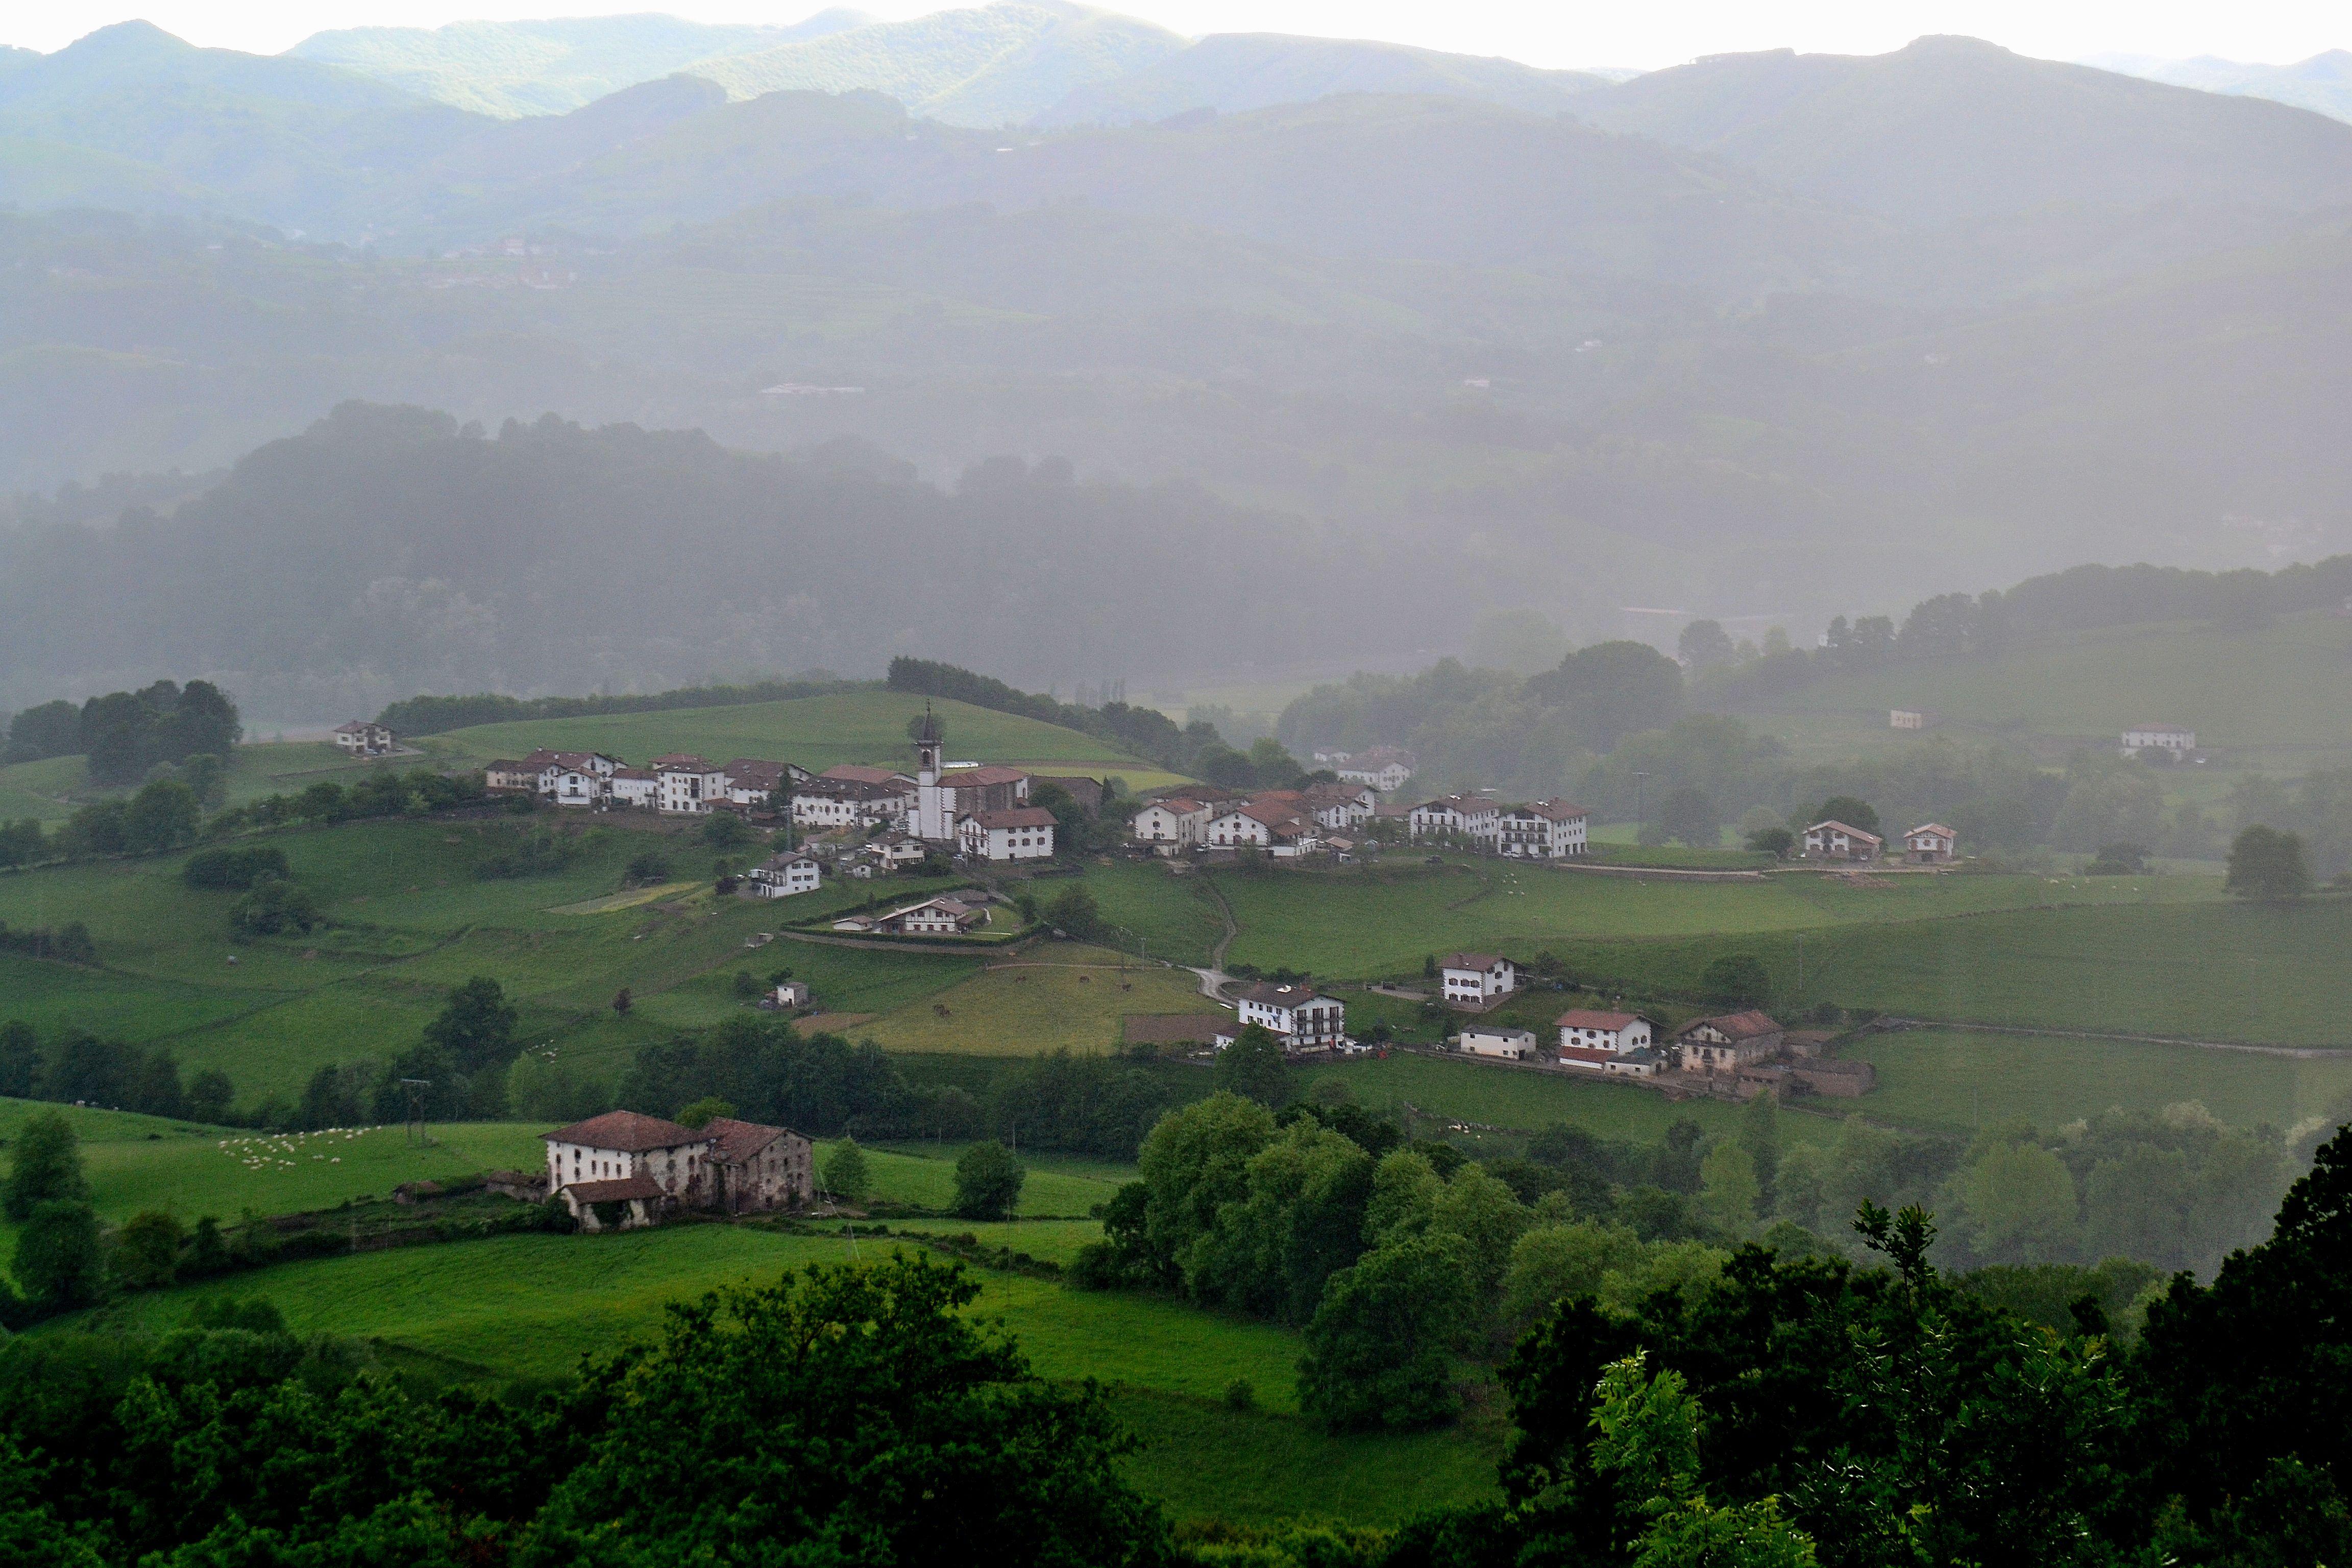 http://upload.wikimedia.org/wikipedia/commons/2/20/Lekarotz._Euskal_Herria.JPG